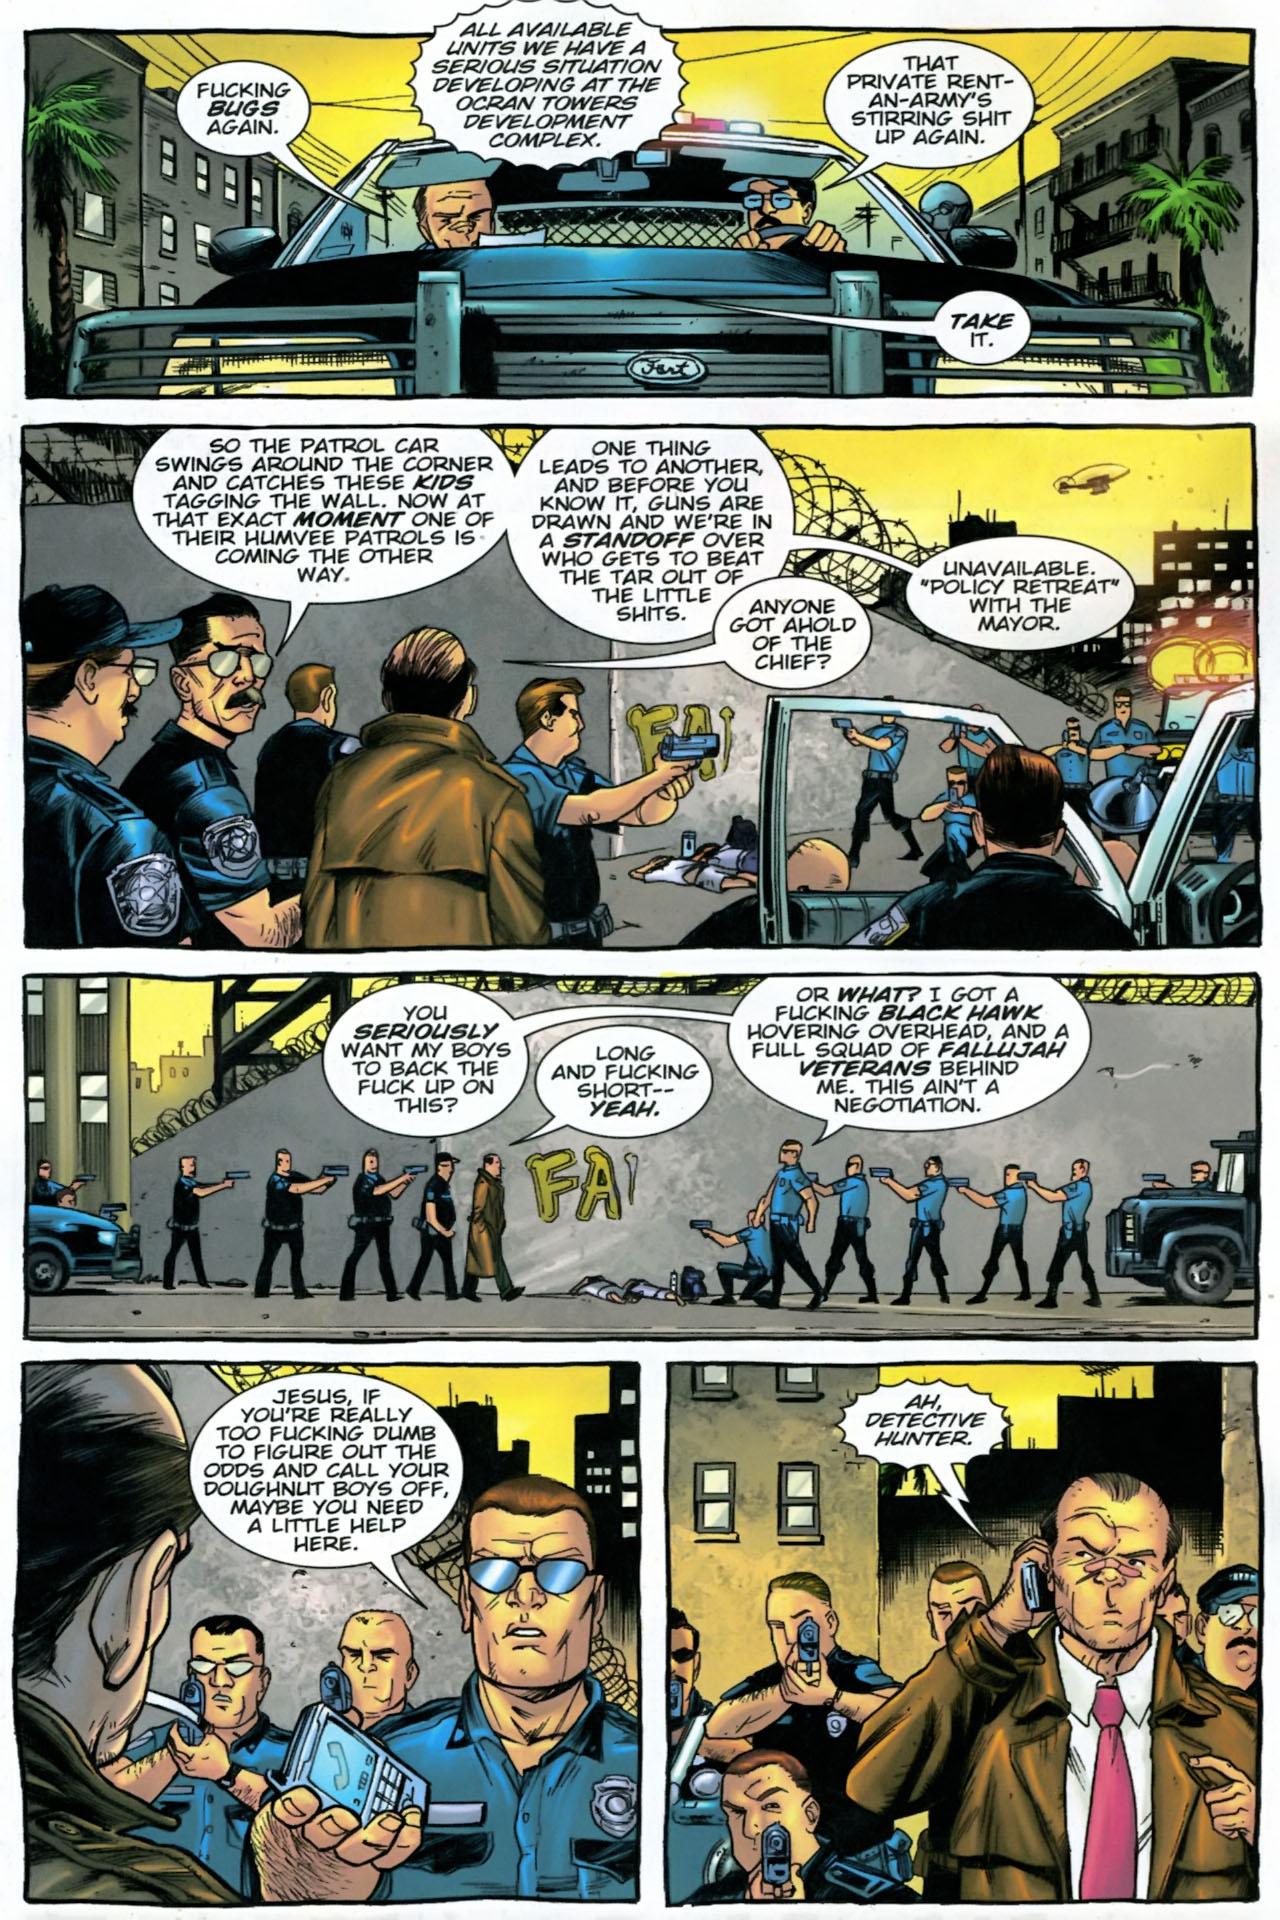 Read online The Exterminators comic -  Issue #28 - 12